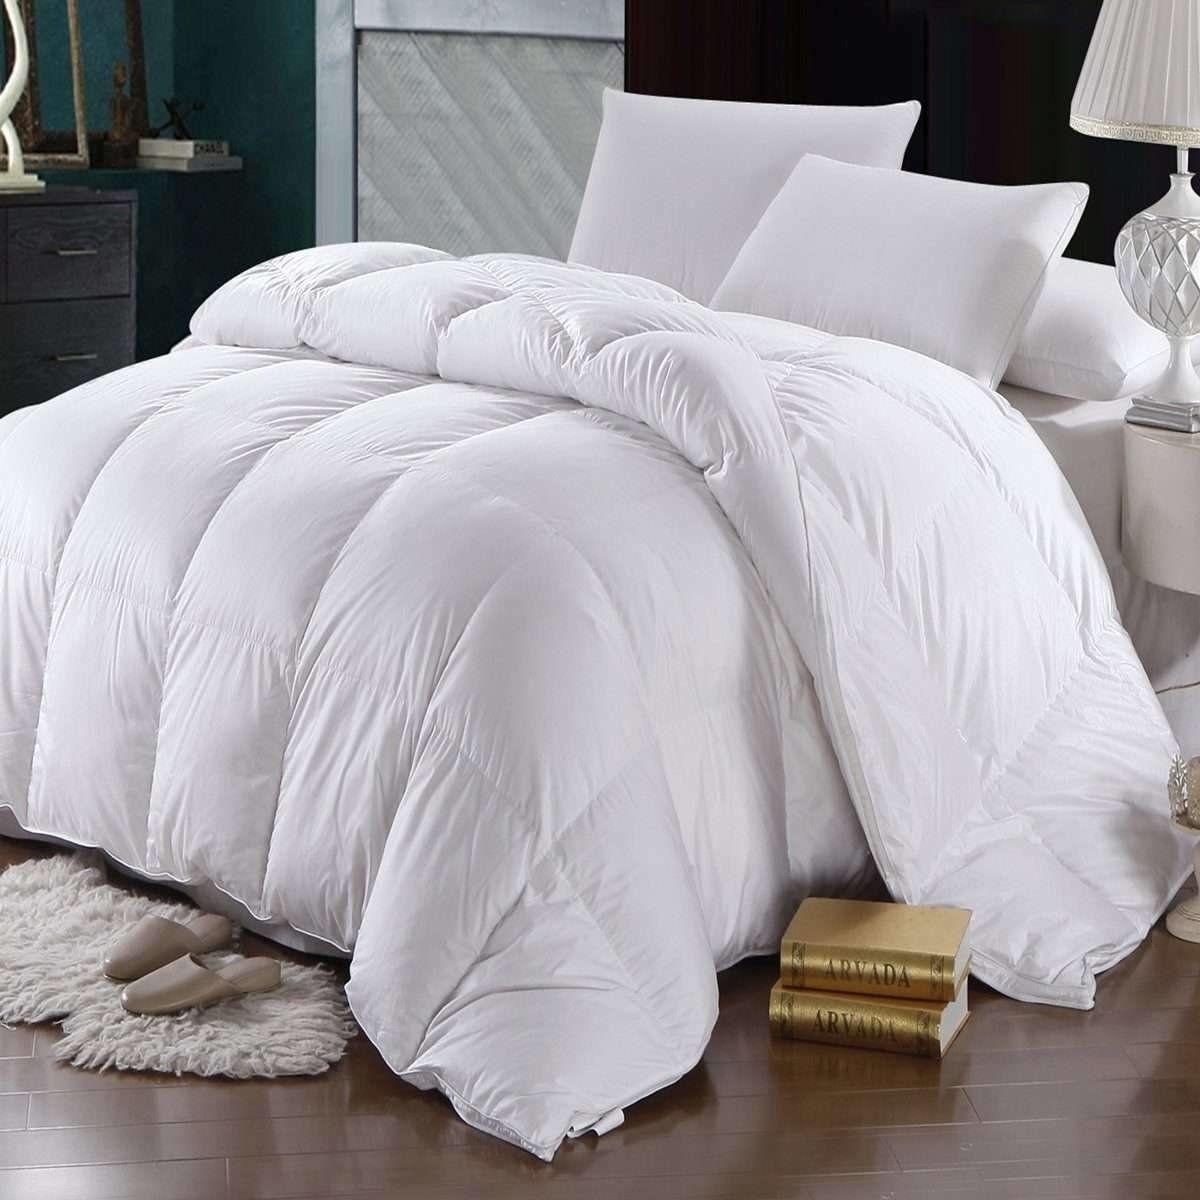 Oversized Winter Weight Goose Down Duvet Down comforter